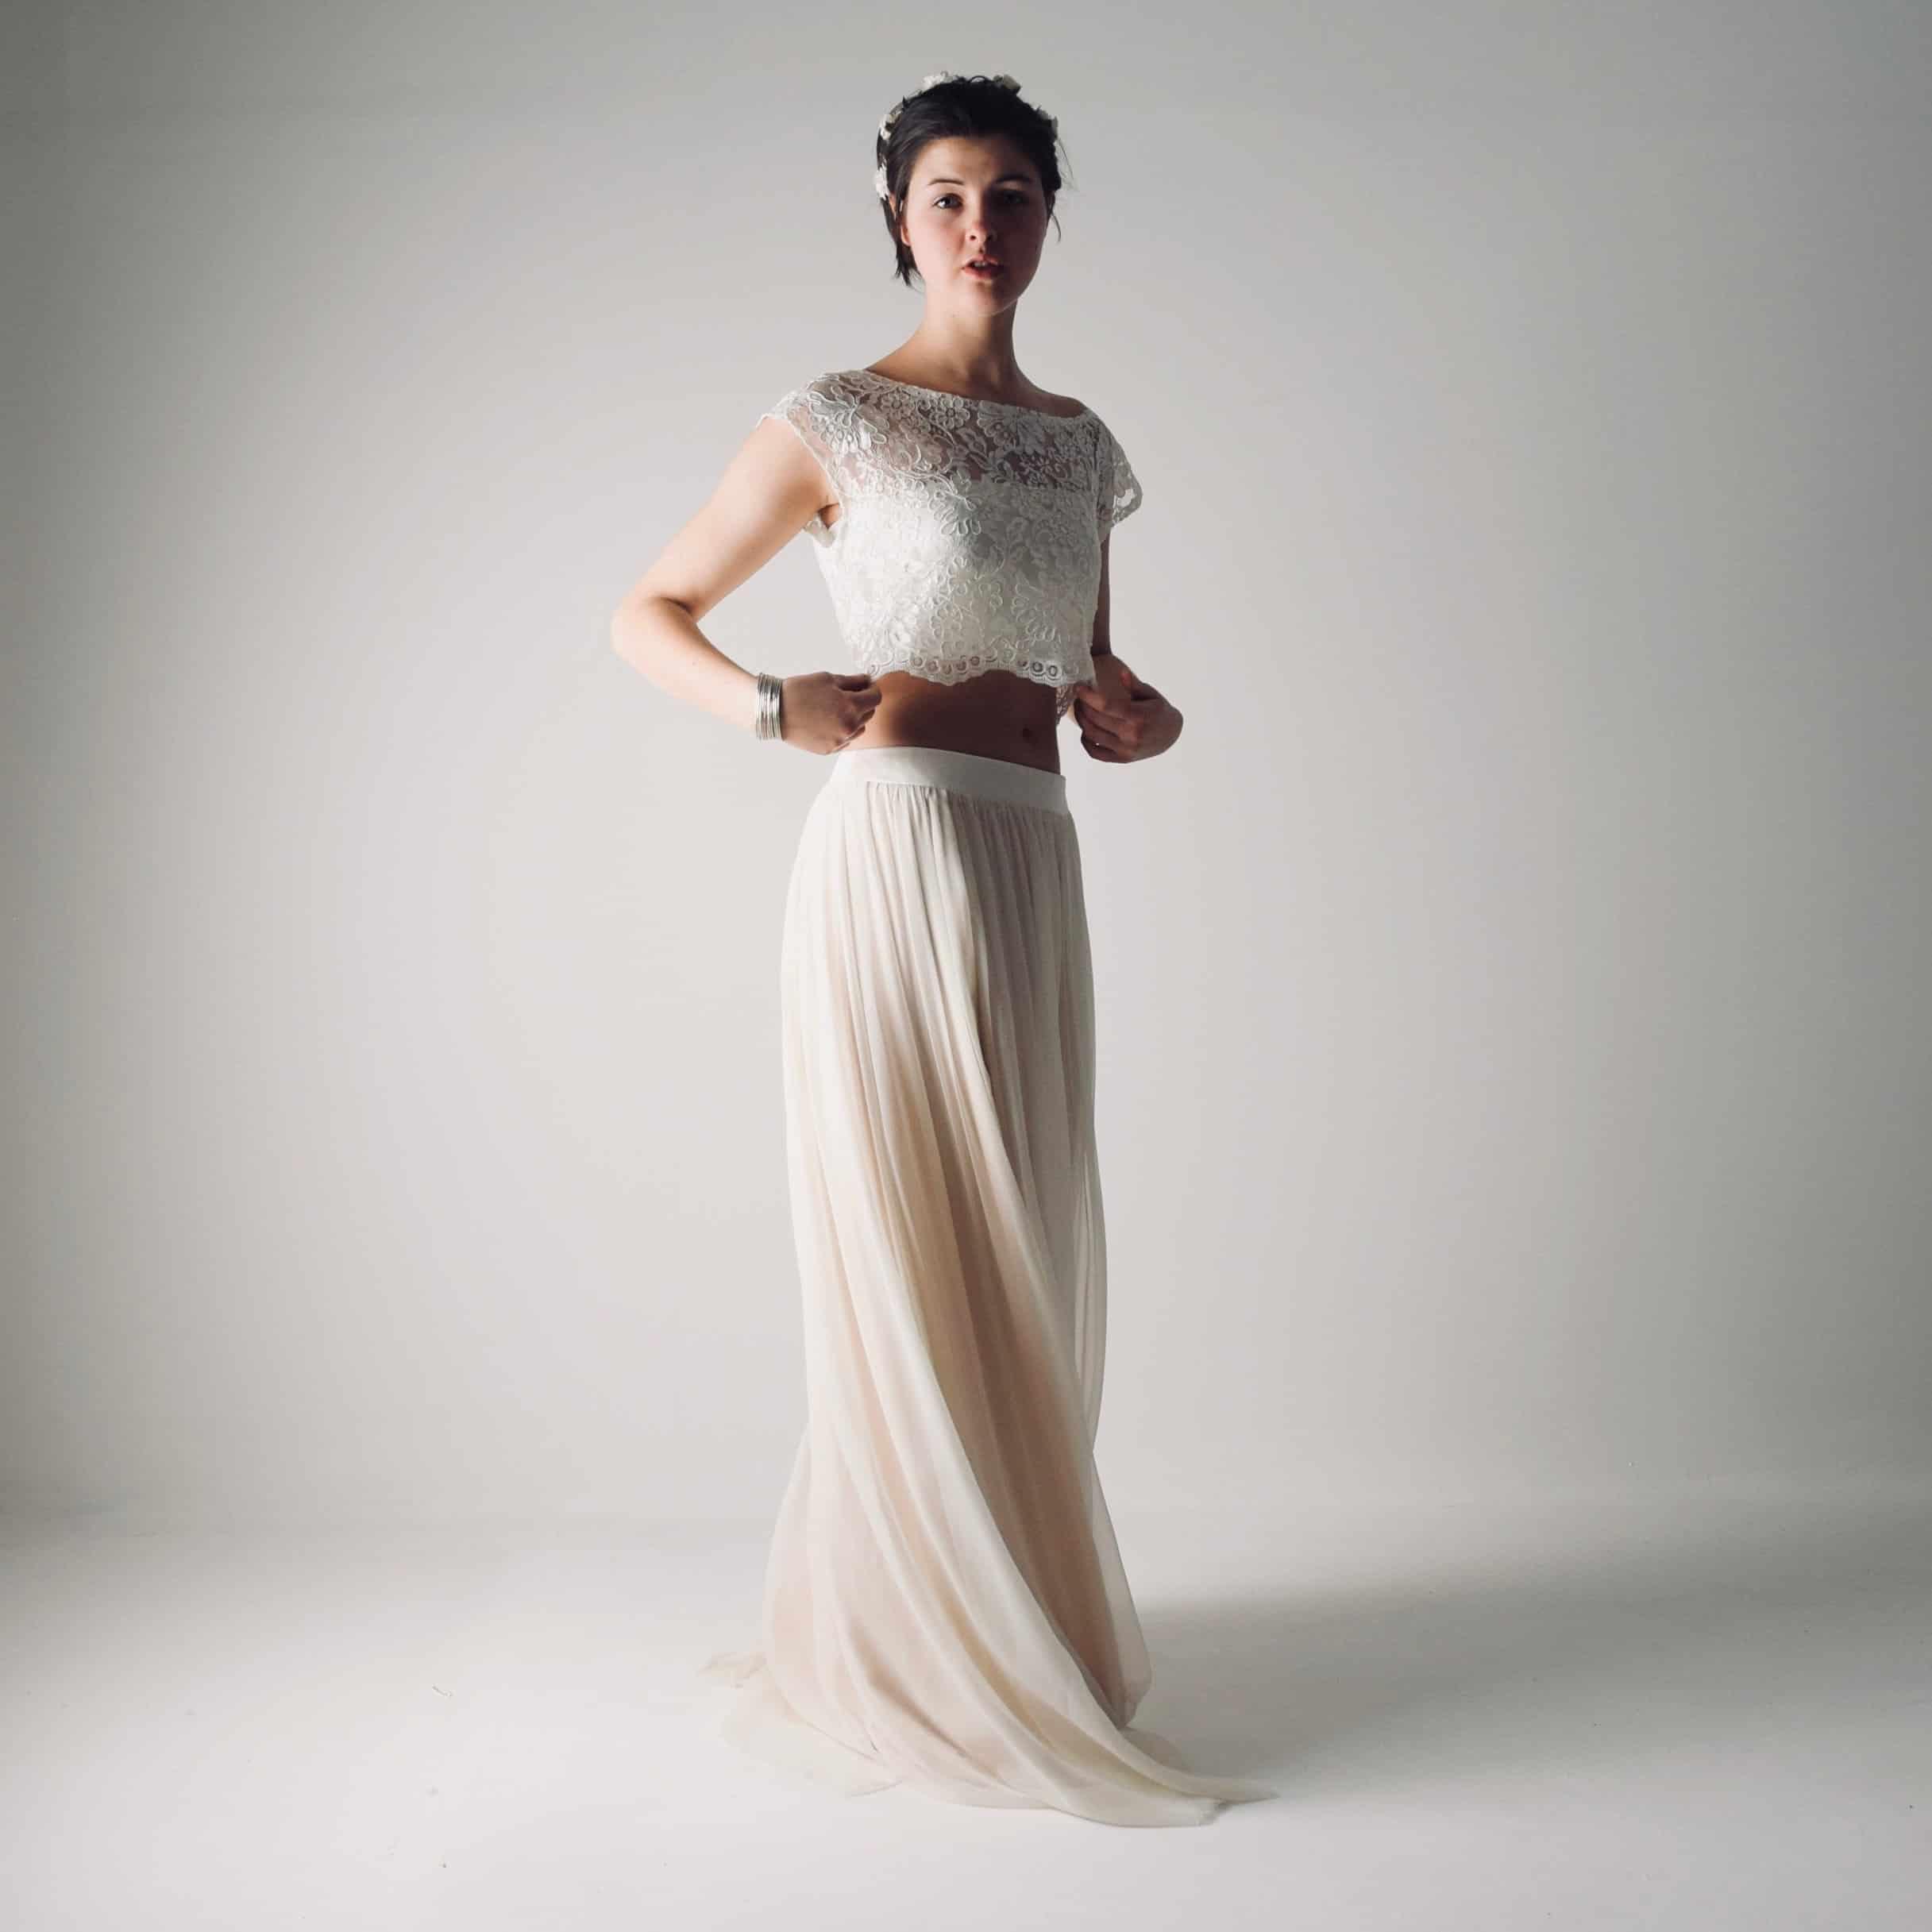 Boho Wedding Dress Separates